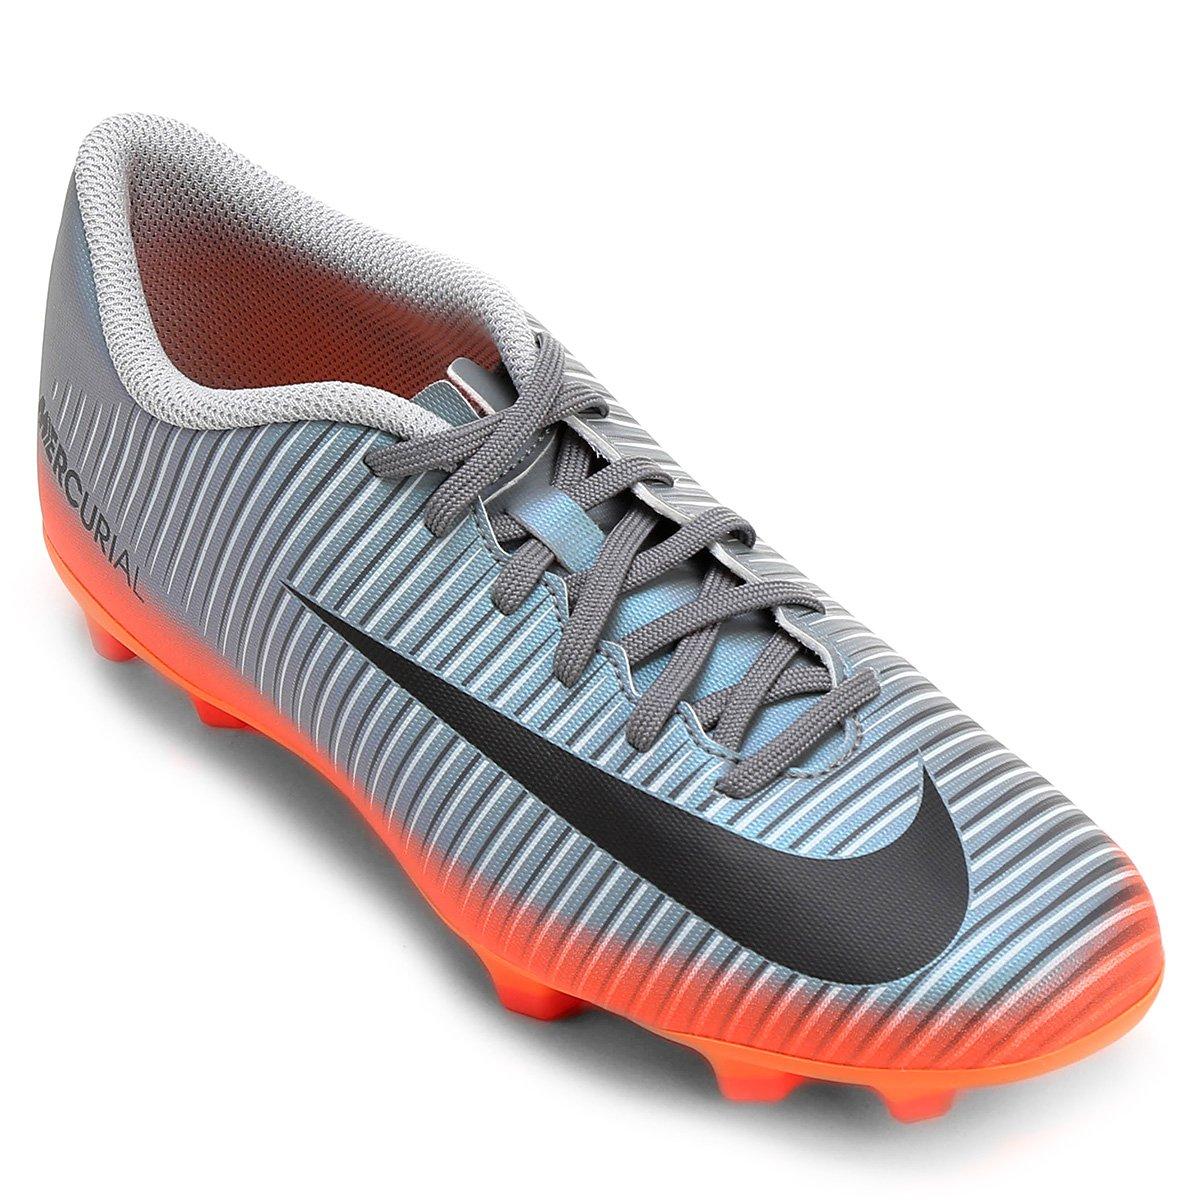 6bc1dc640fa79 Chuteira Campo Nike Mercurial Vortex 3 CR7 FG | Netshoes